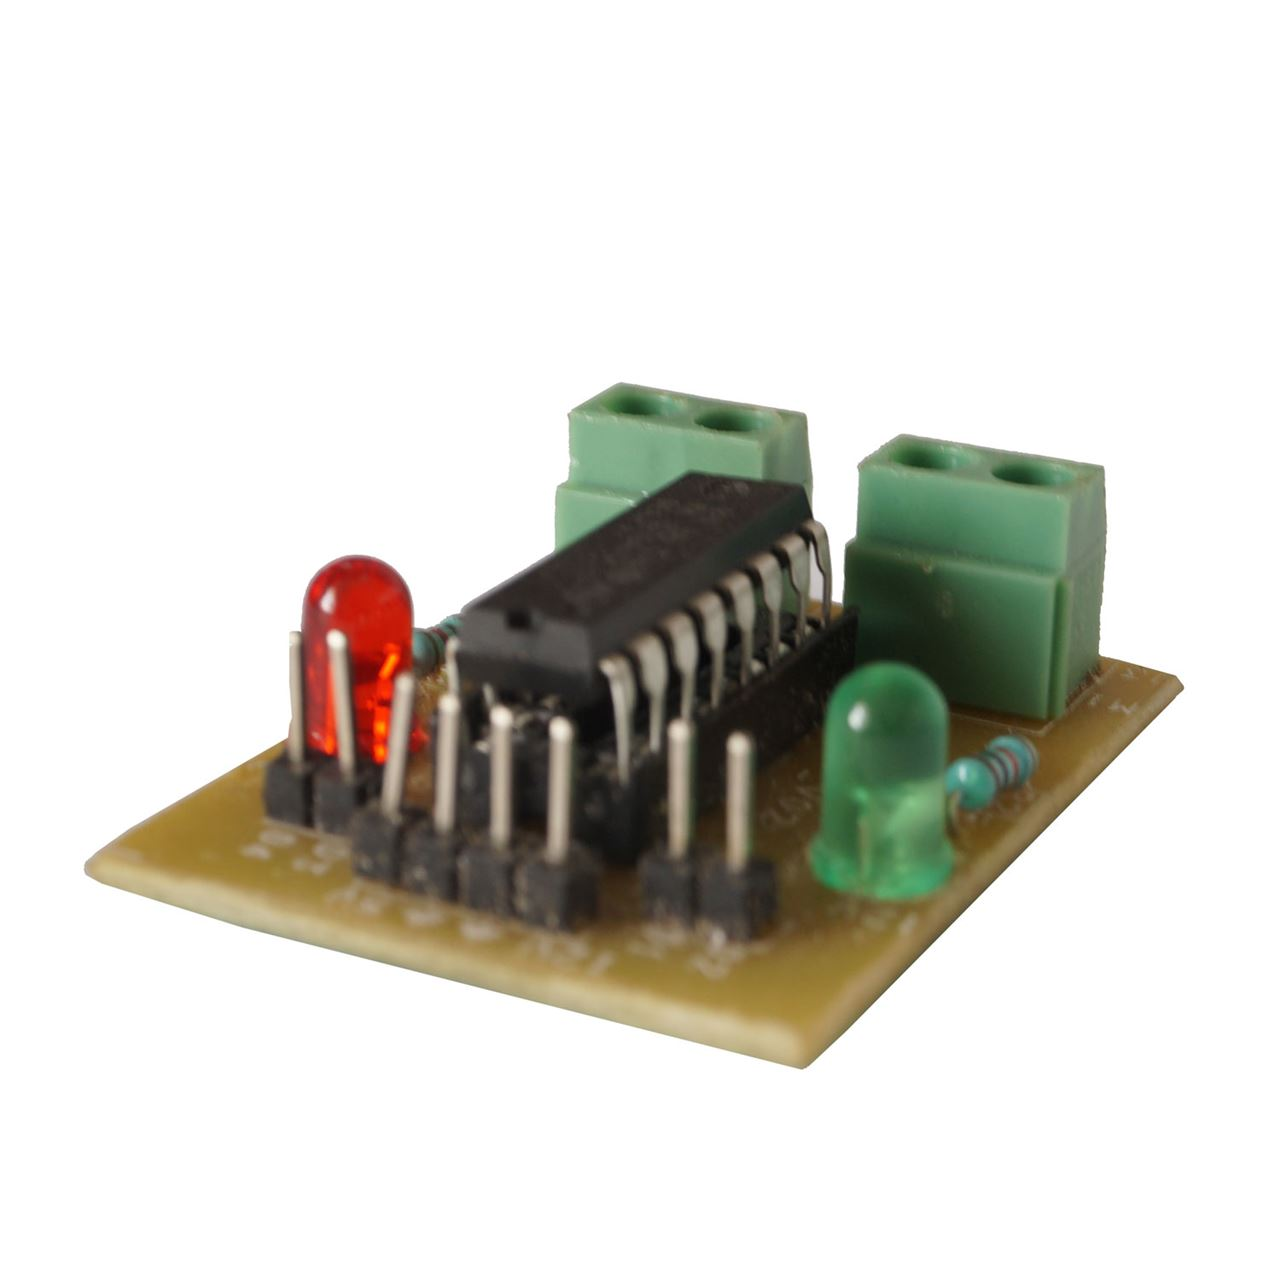 L293d motor driver for L293d motor driver module